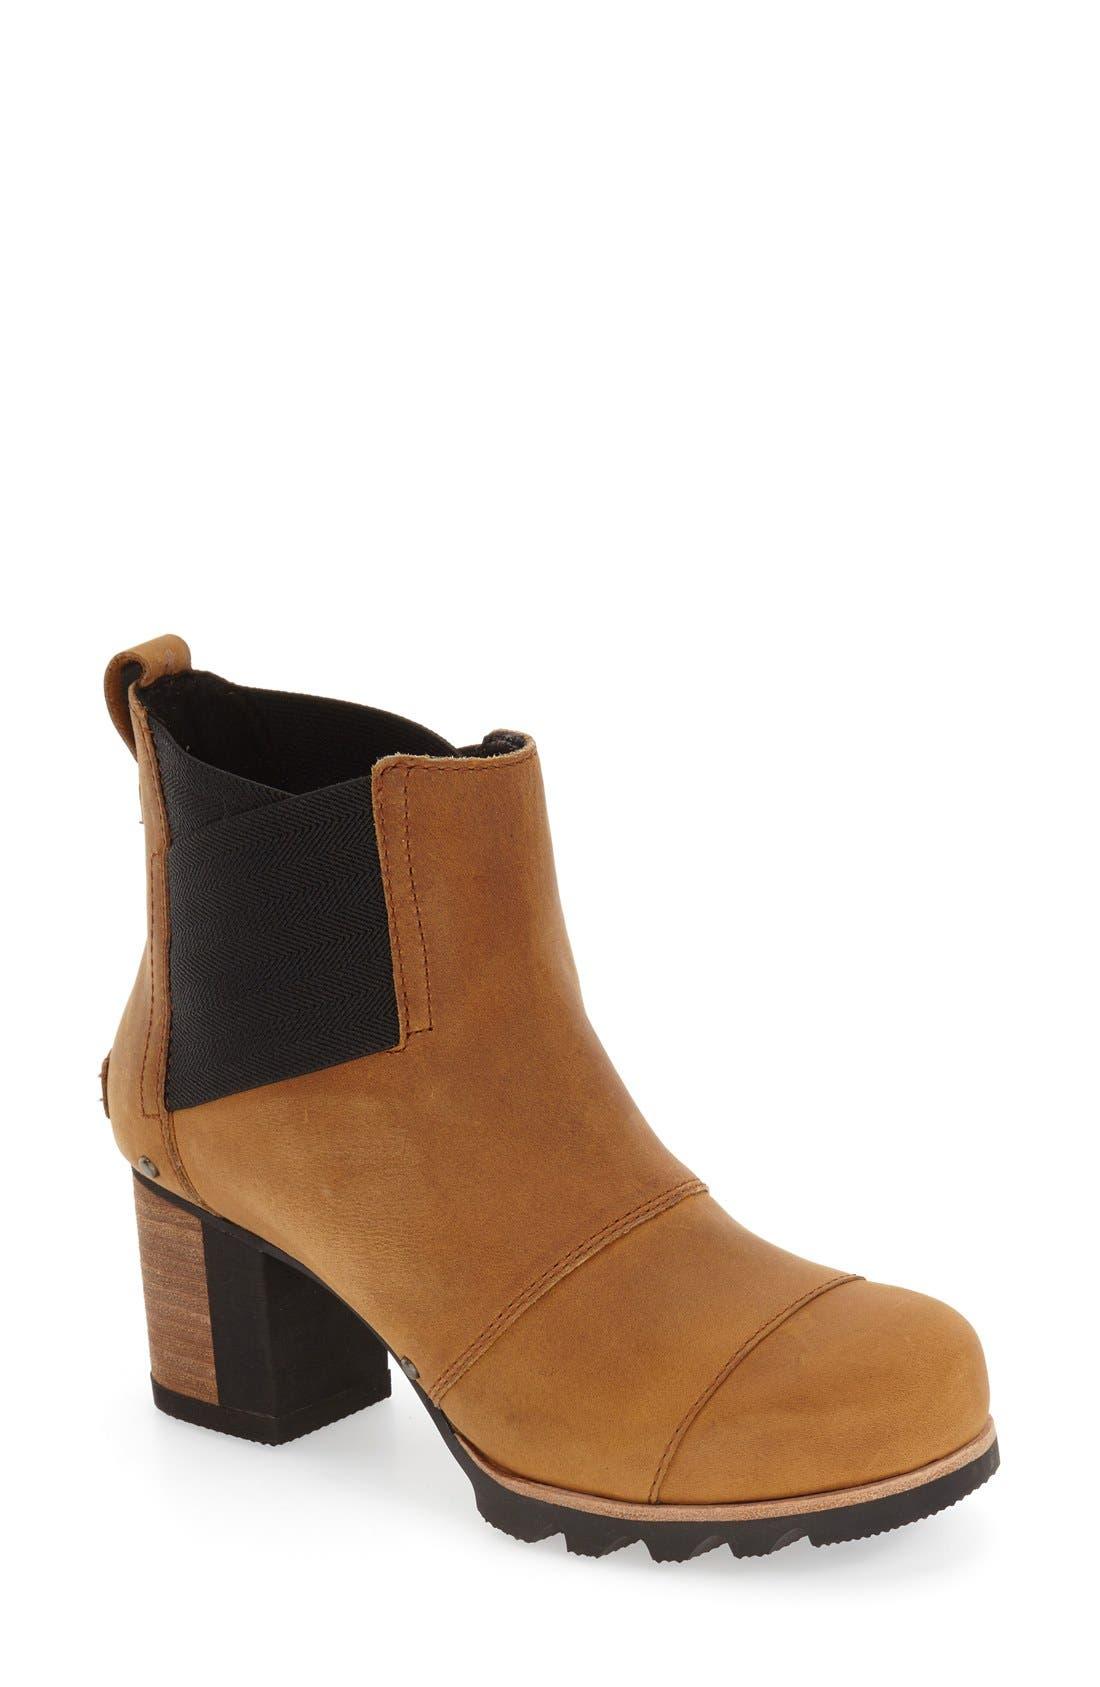 'Addington' Waterproof Chelsea Boot,                         Main,                         color, Autumn Bronze